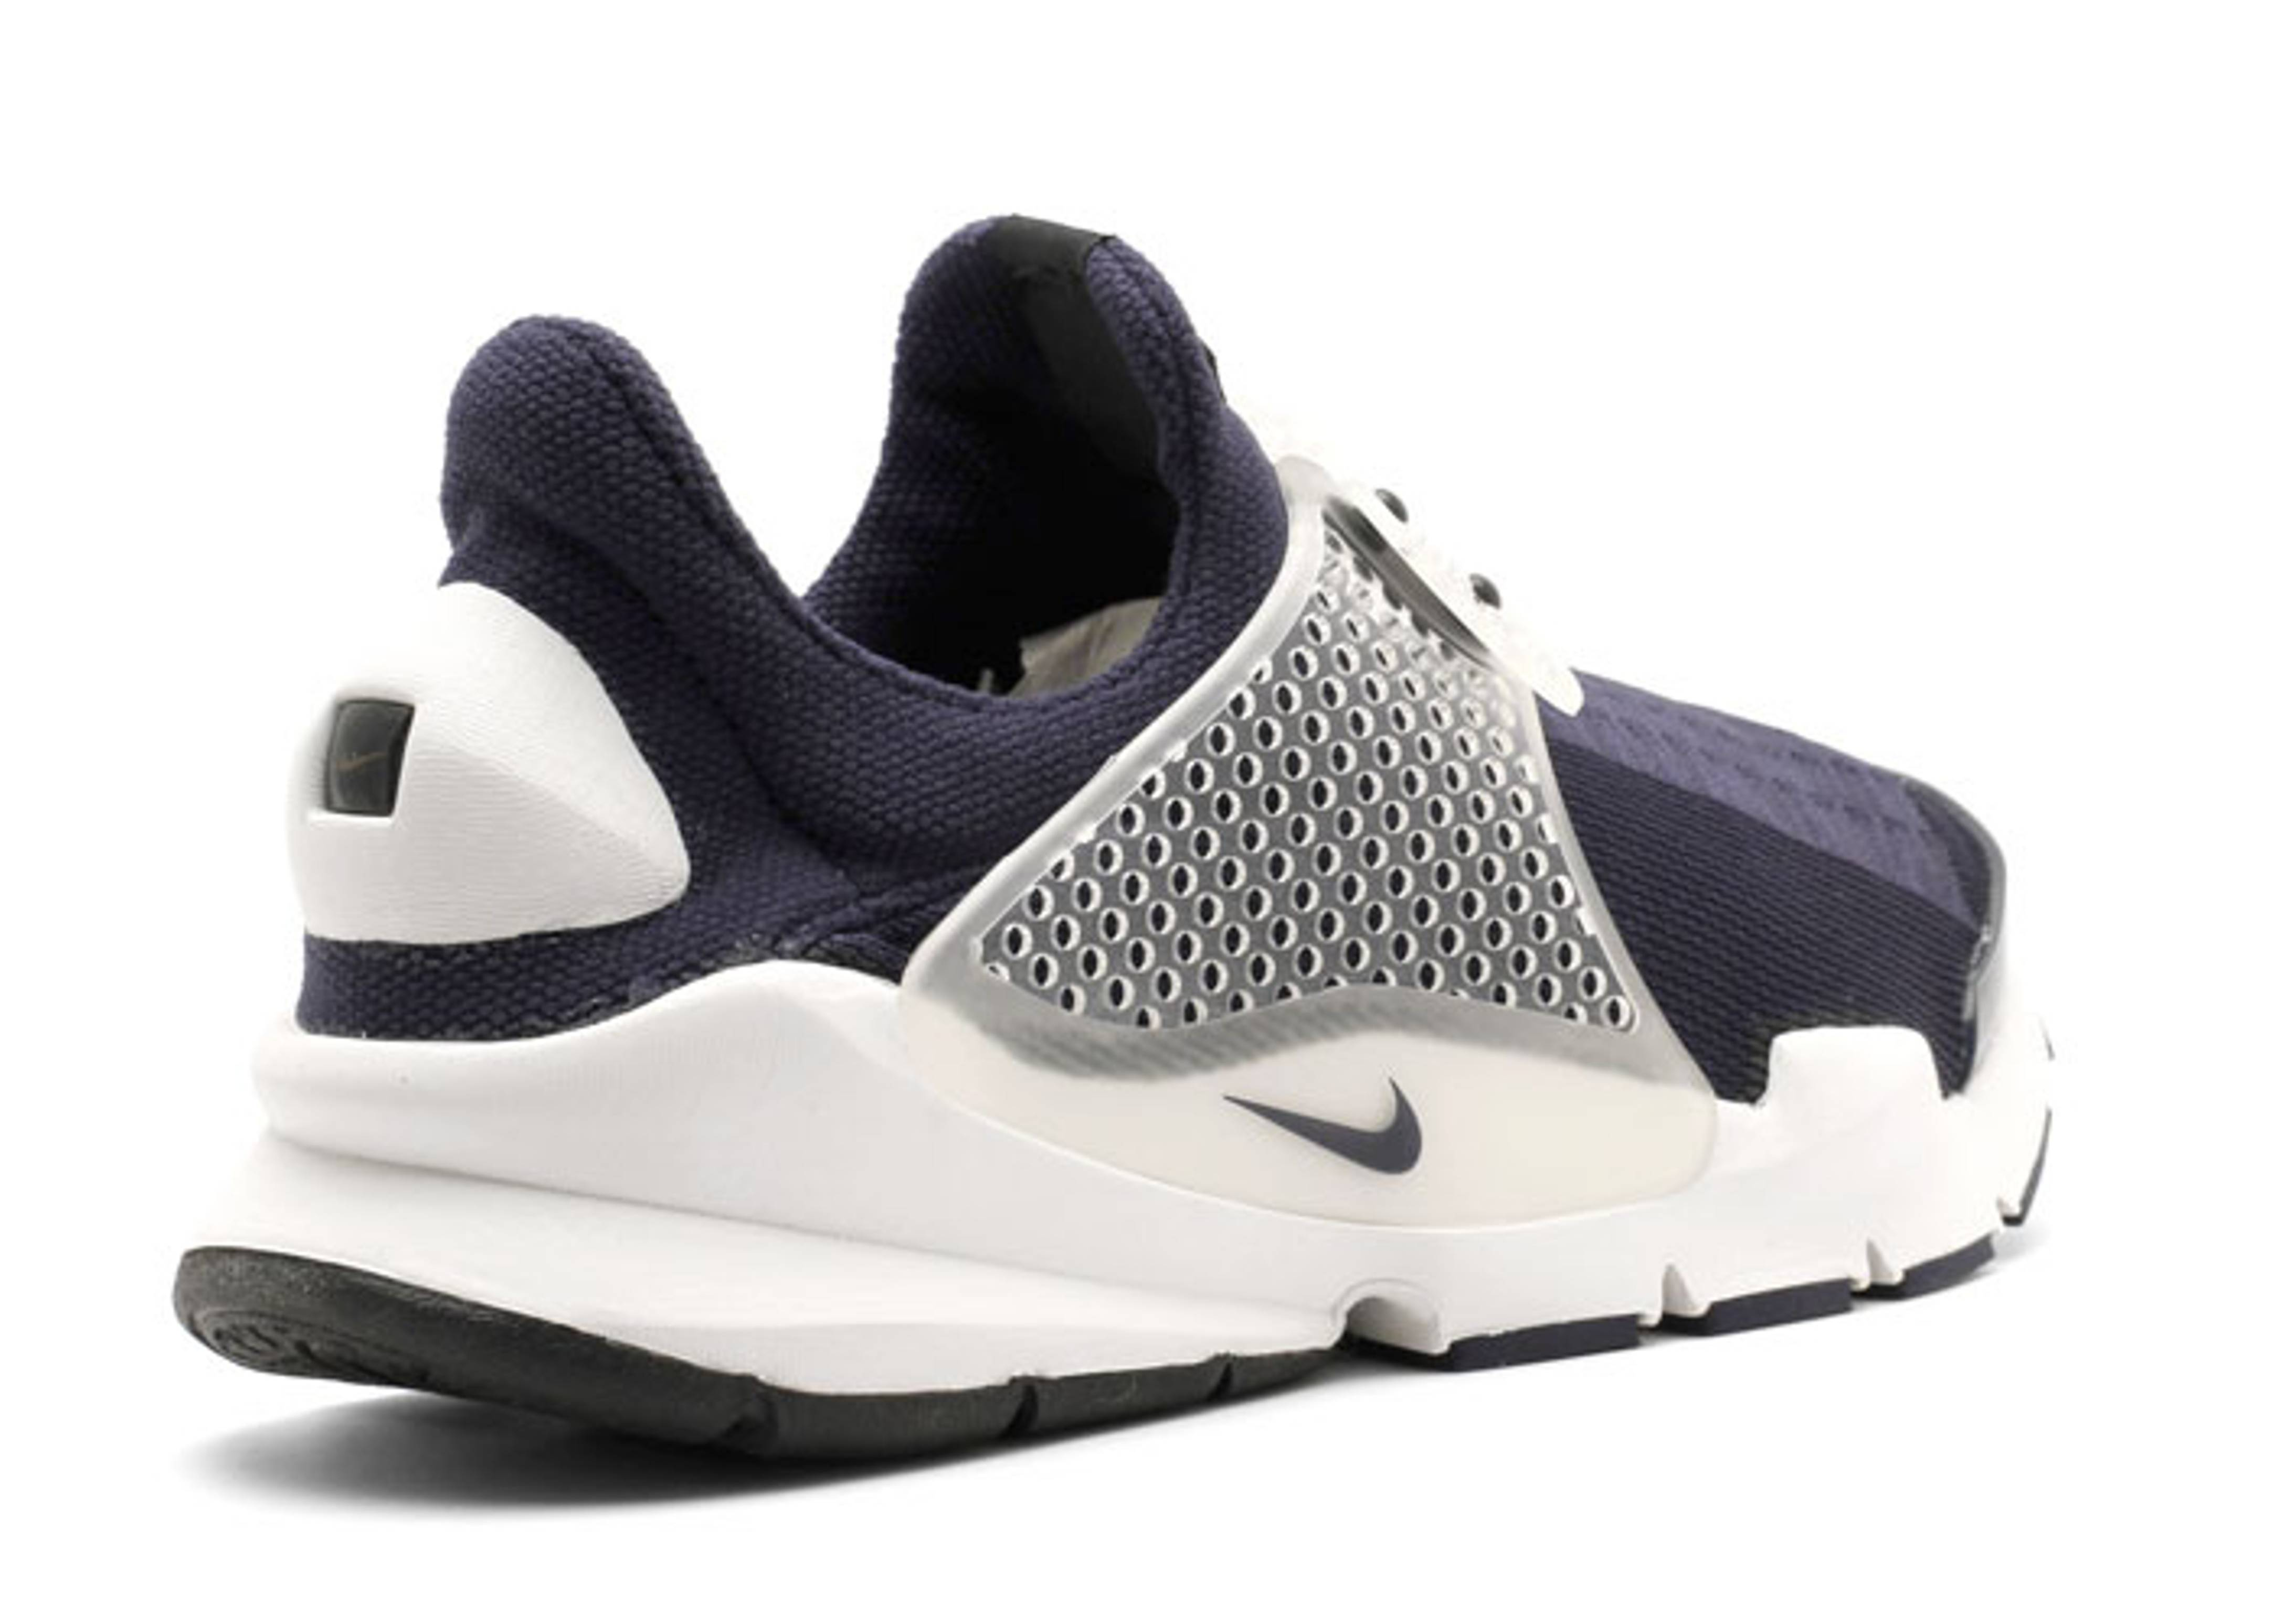 supra chaussure femme - sock dart sp/fragment - obsidian/summit white - Nike | Flight Club